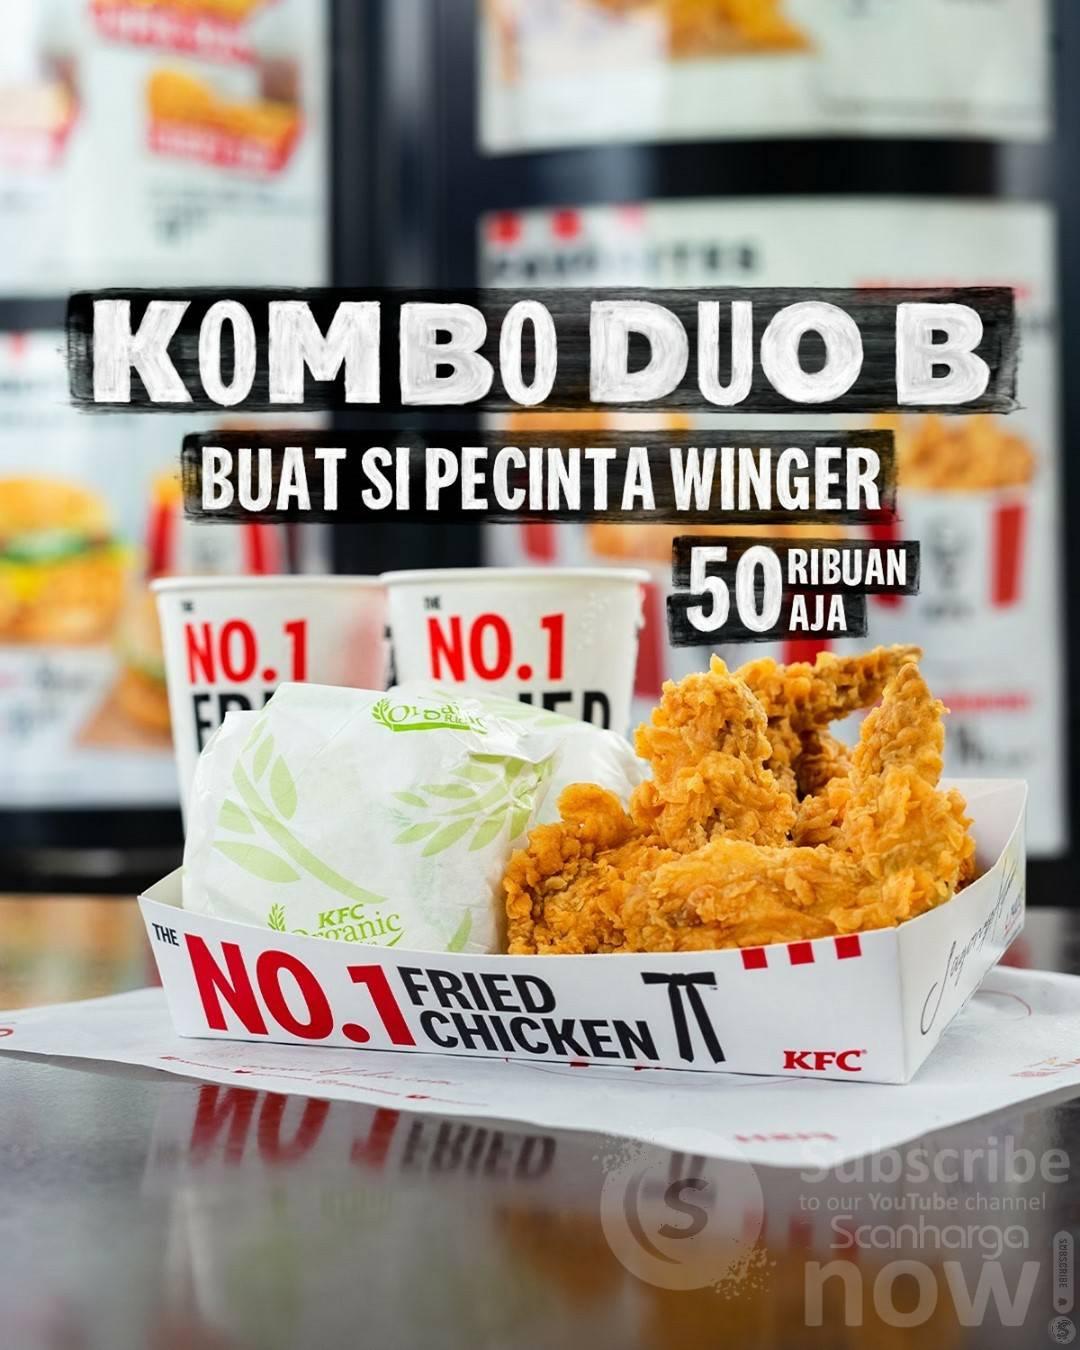 KFC KOMBO DUO B